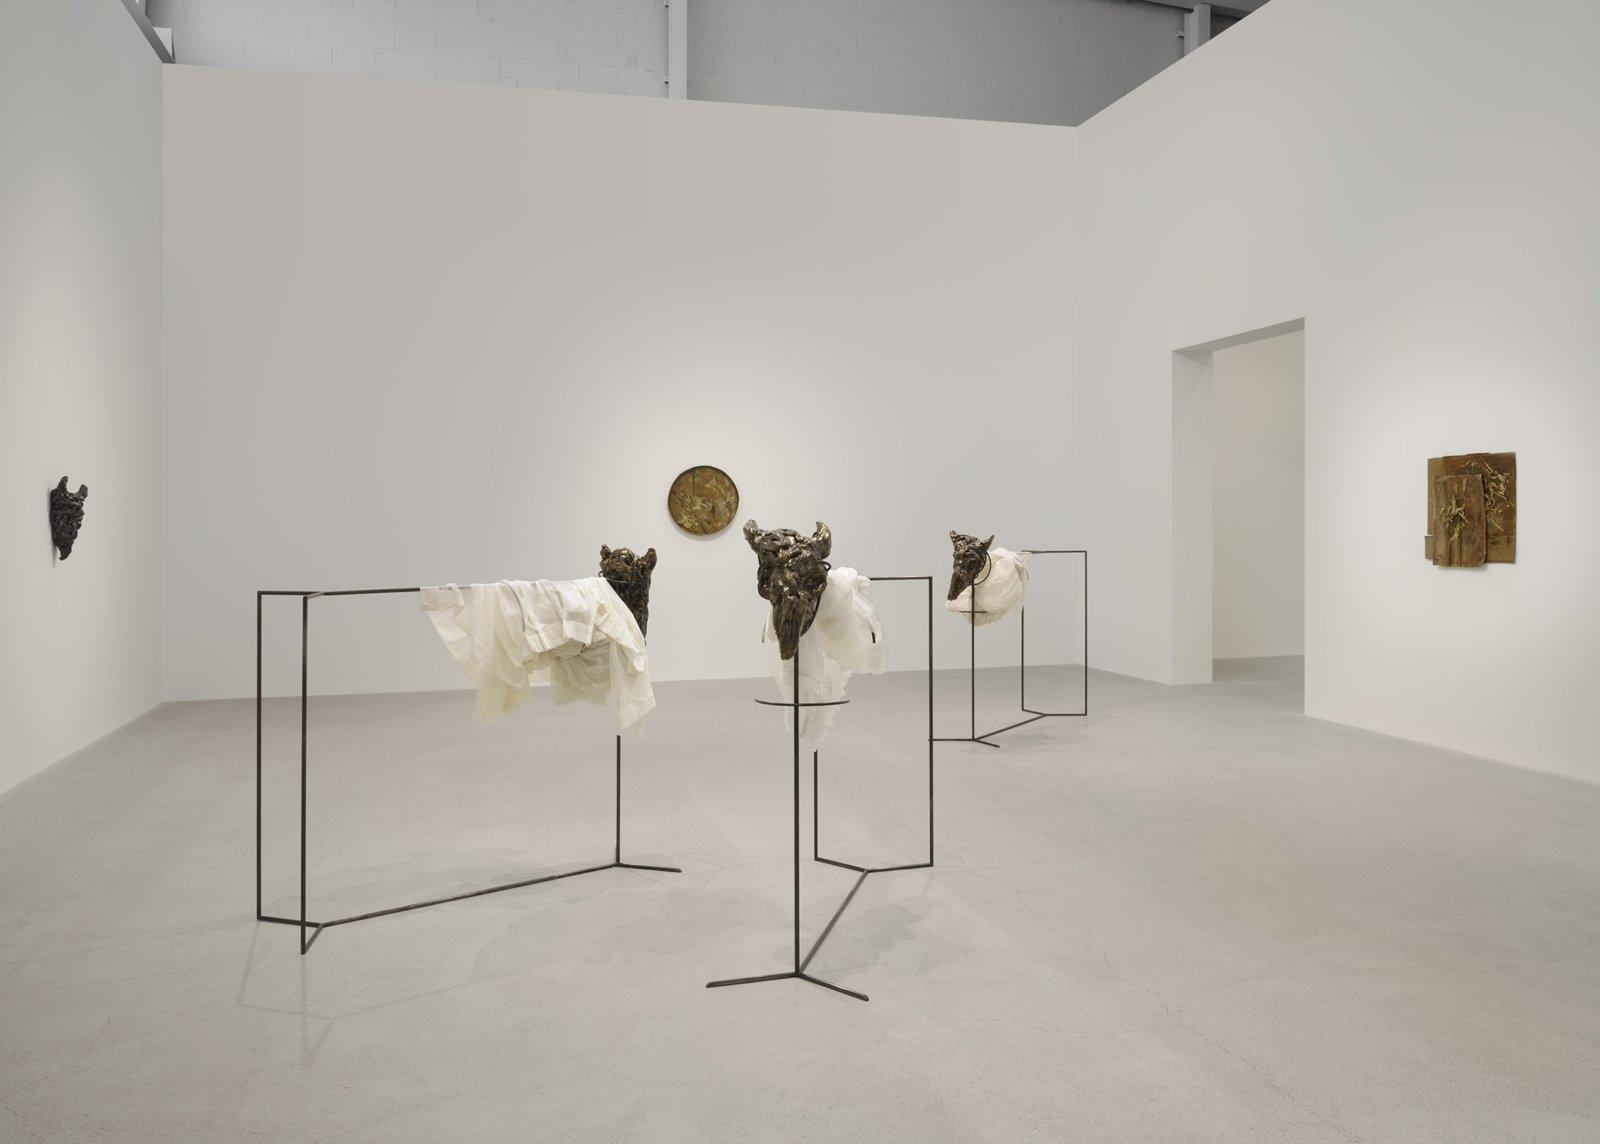 Rochelle Goldberg, installation view, gatekeepers, Catriona Jeffries, Vancouver, 2019 by Rochelle Goldberg